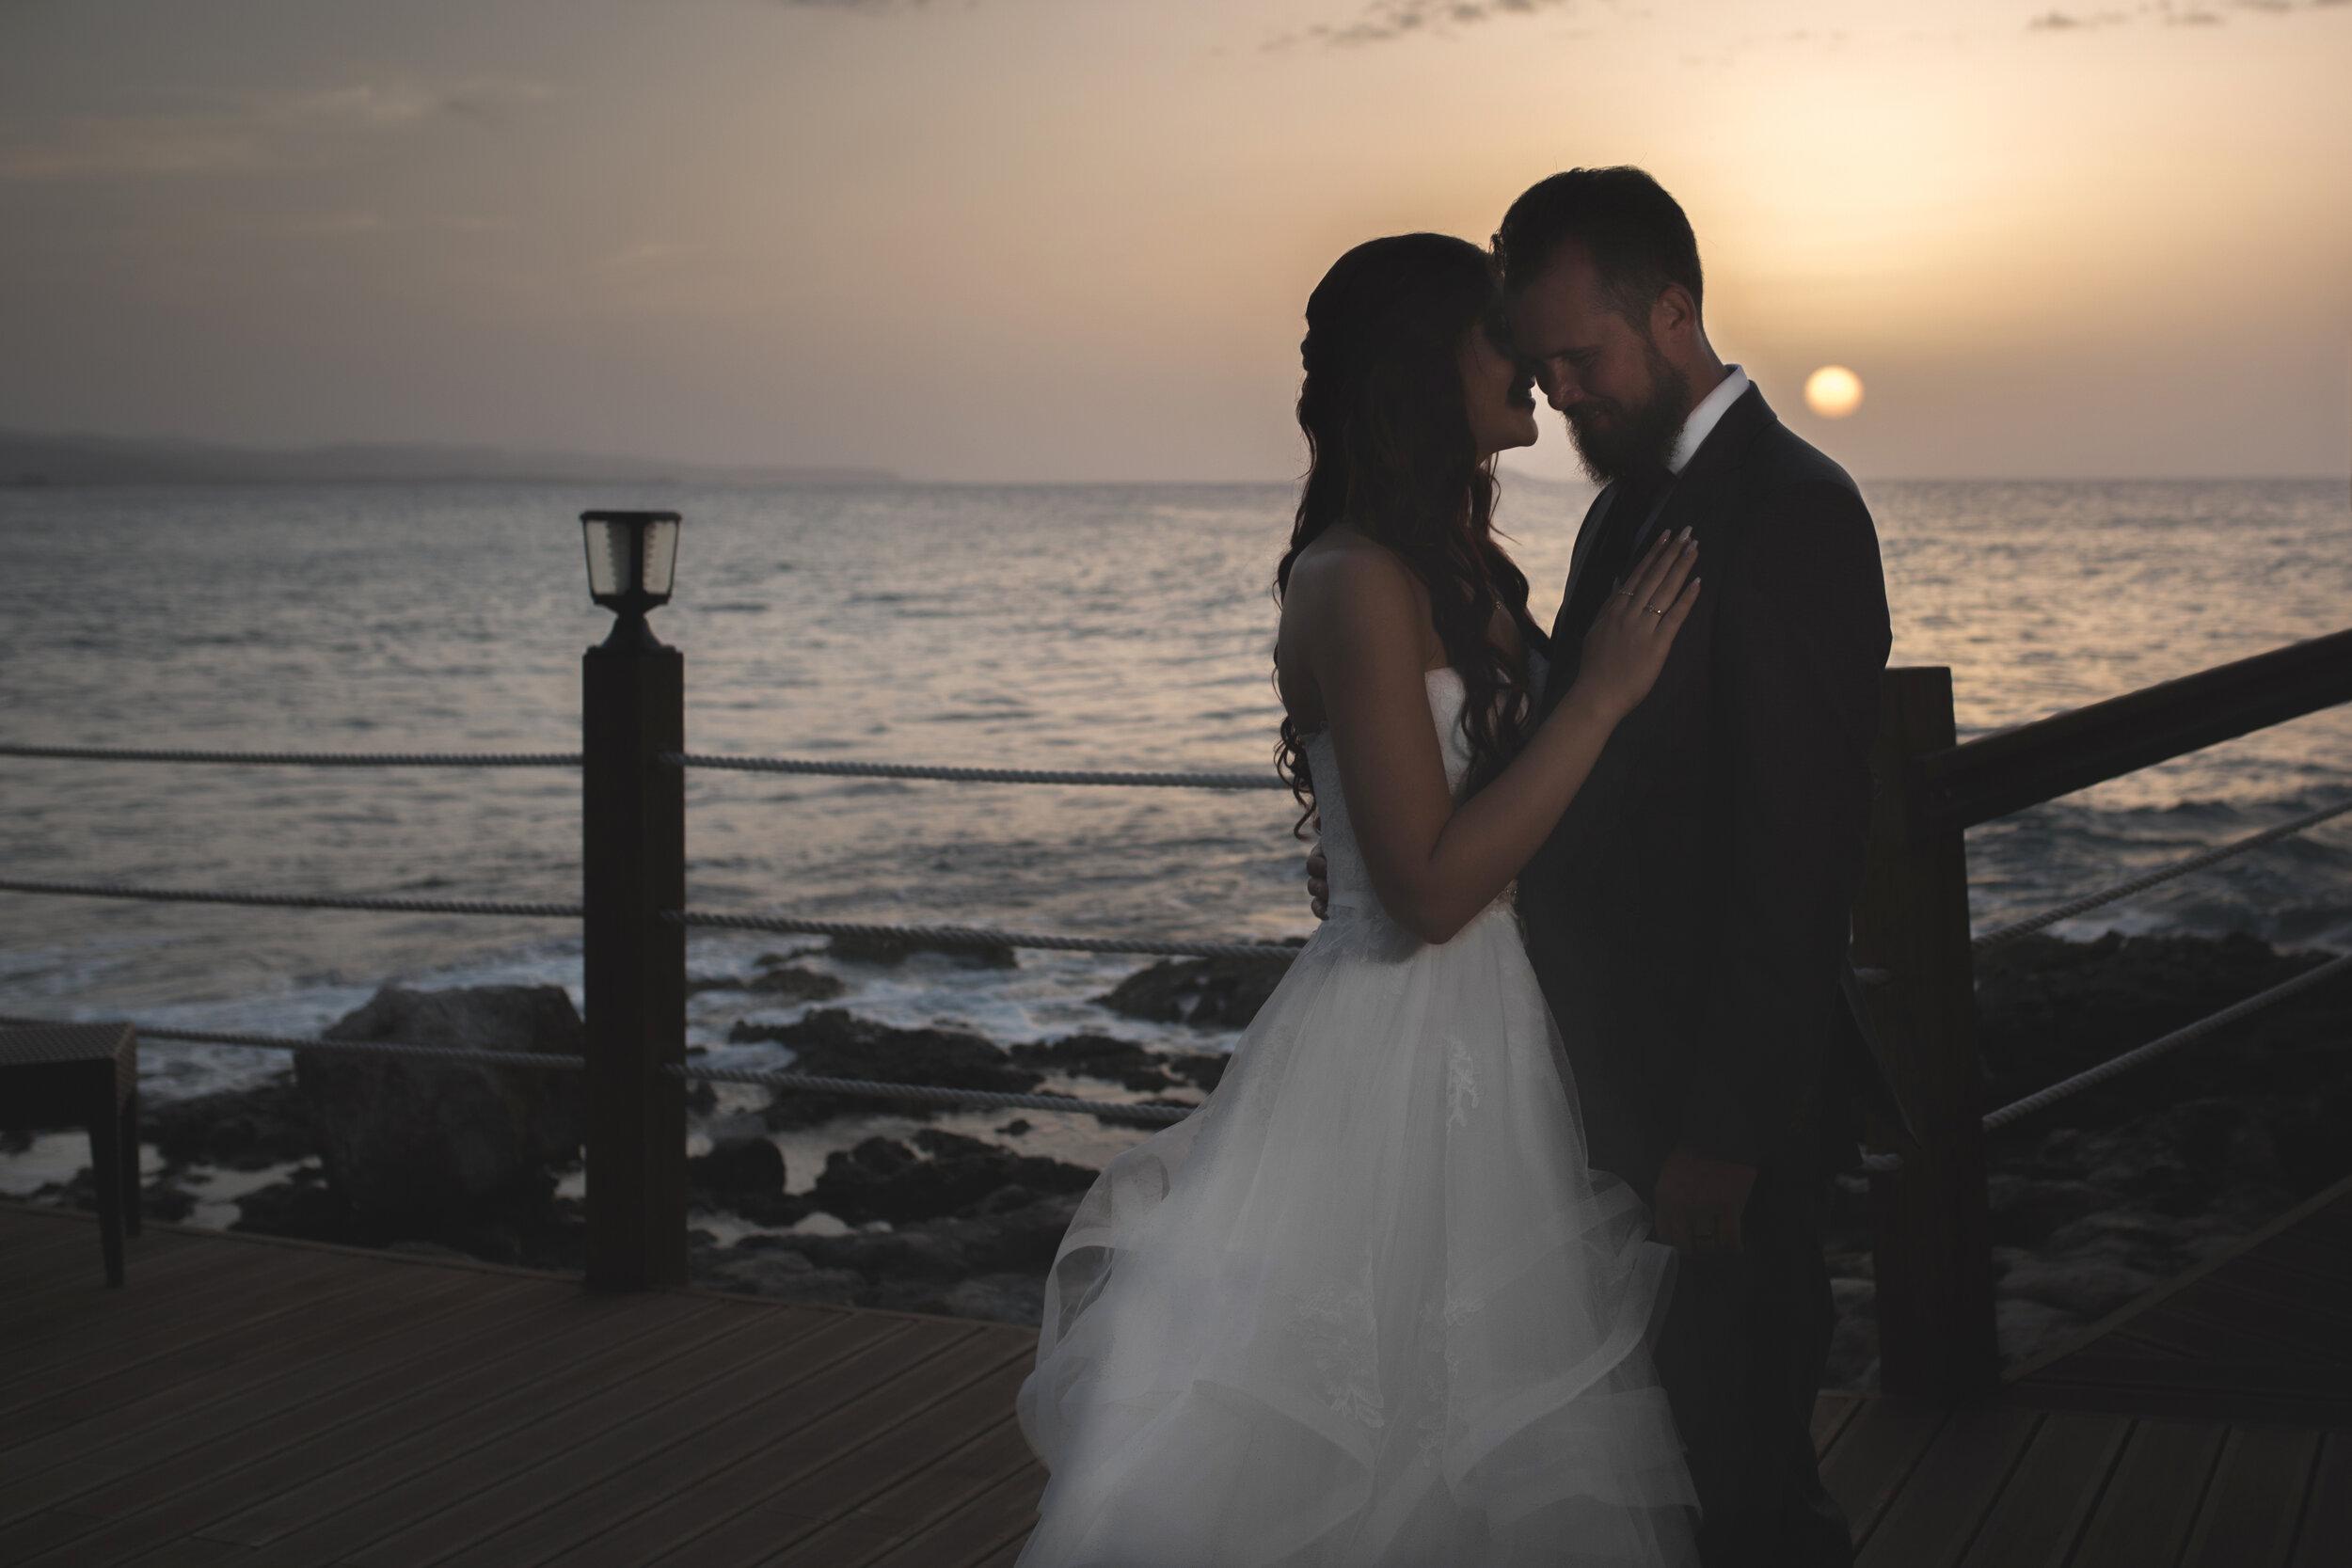 04-Adam-Ziorio-Photography-Emily&Mason-Jamaica-Wedding.jpg